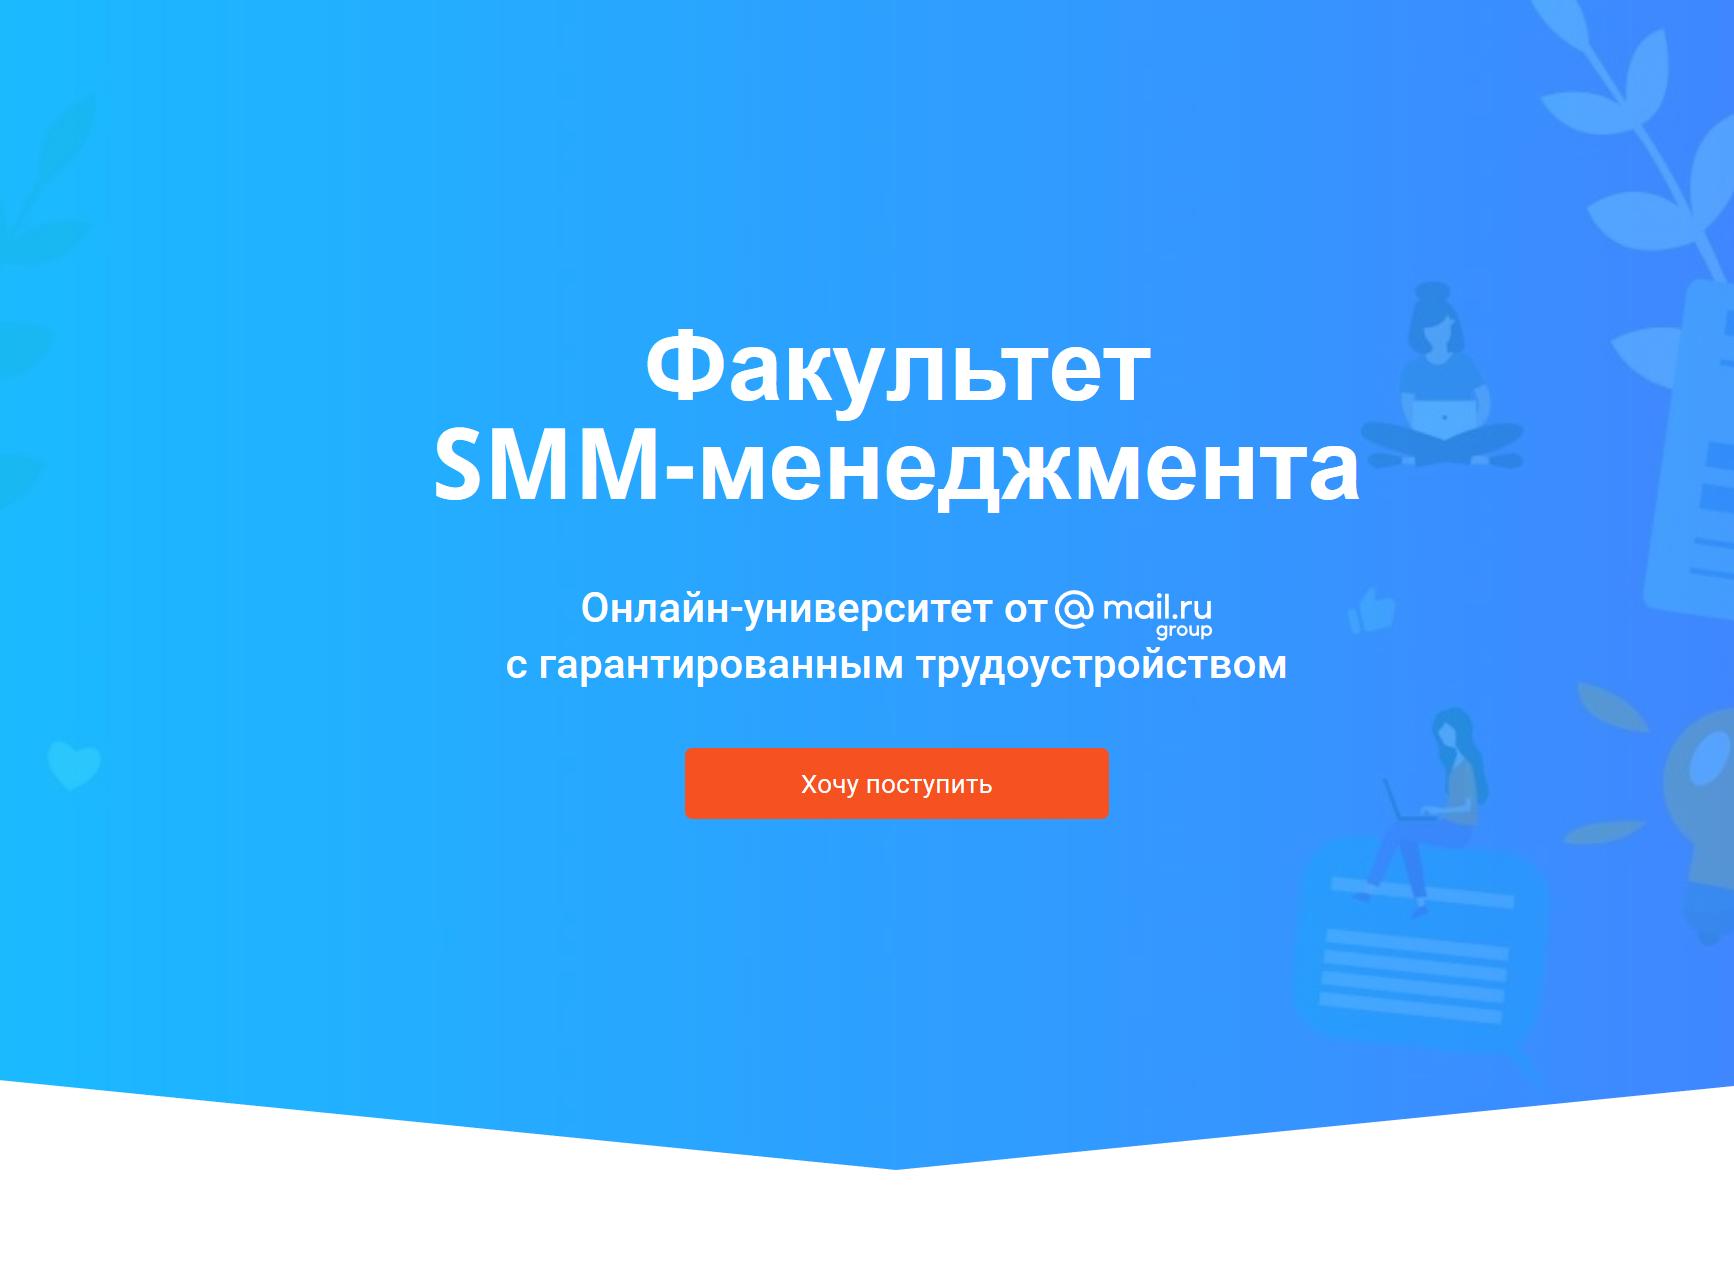 Факультет SMM-менеджмента от GeekBrains